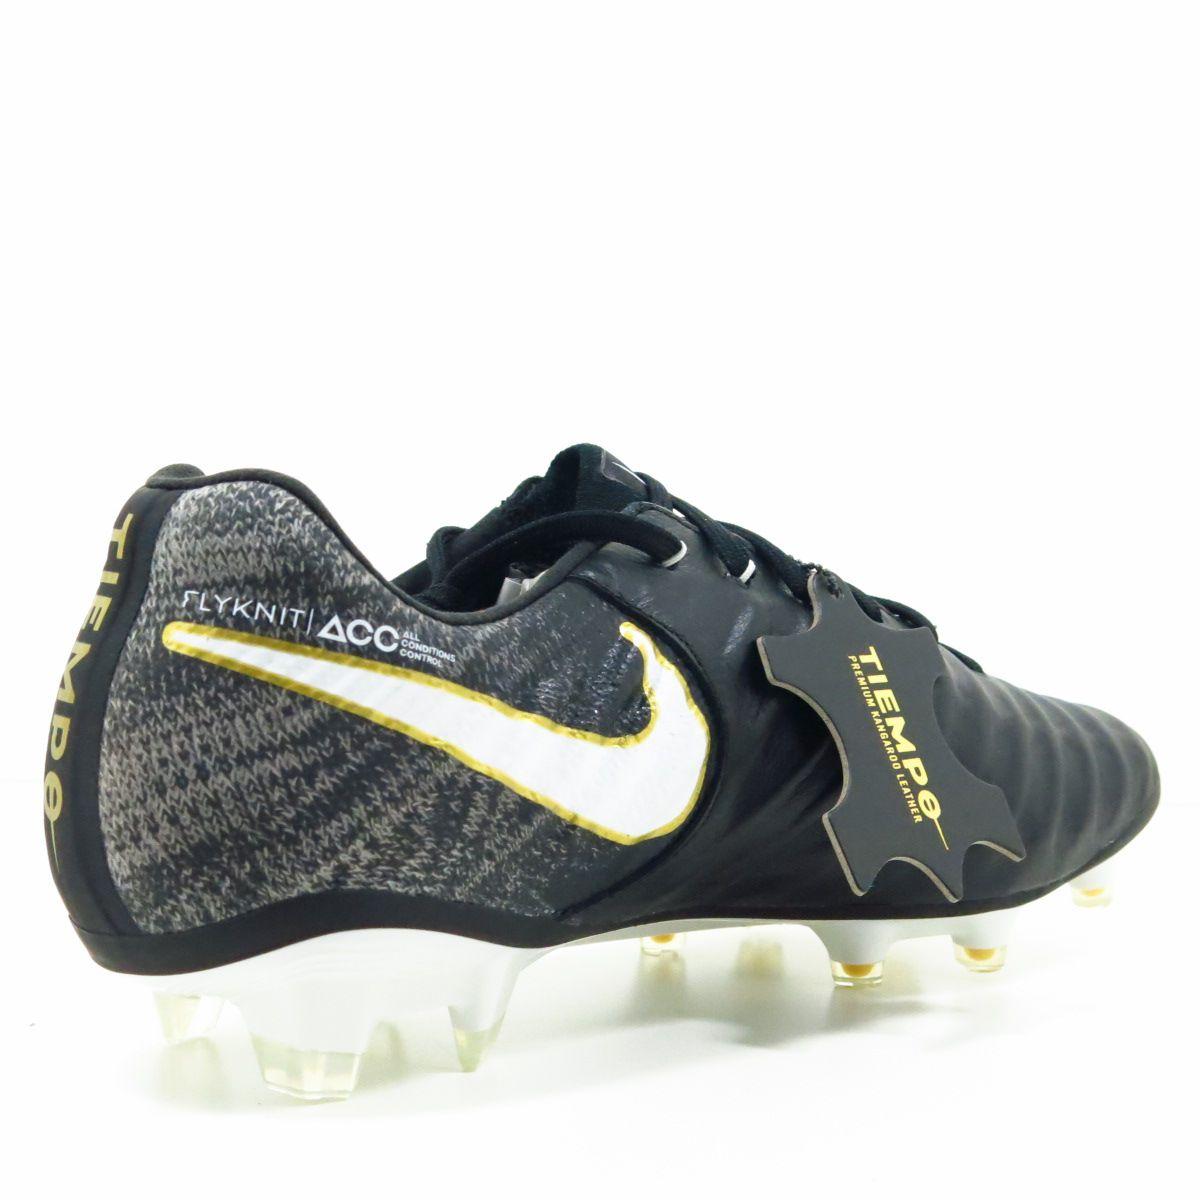 Chuteira Nike Tiempo Legend VII Elite FG - Couro de Canguru